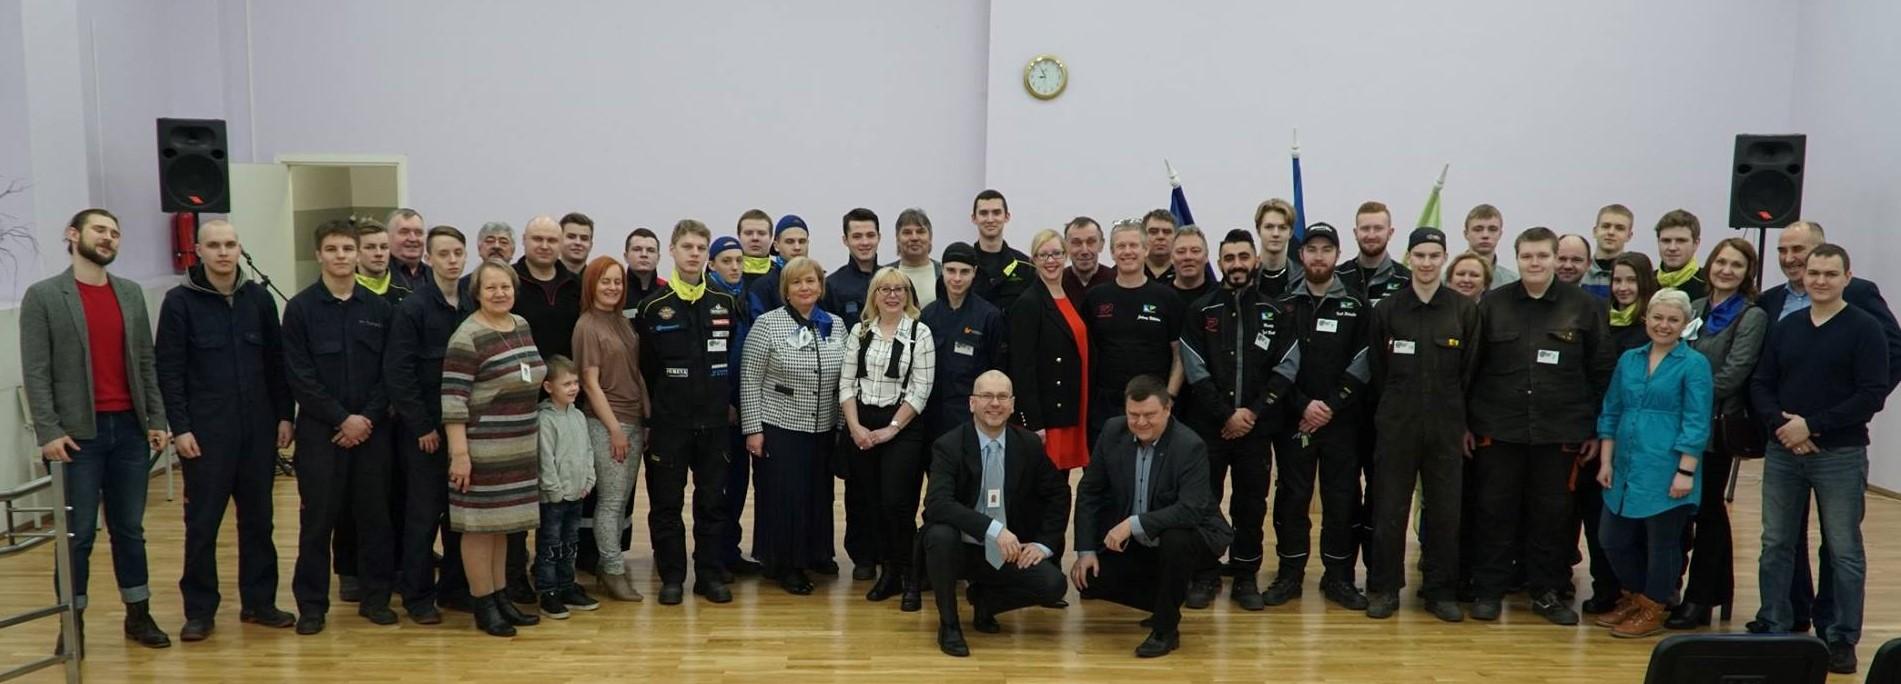 """Viru Welder 2019"" osalejad ja korraldajad. Foto: Ruslan Motõzen"